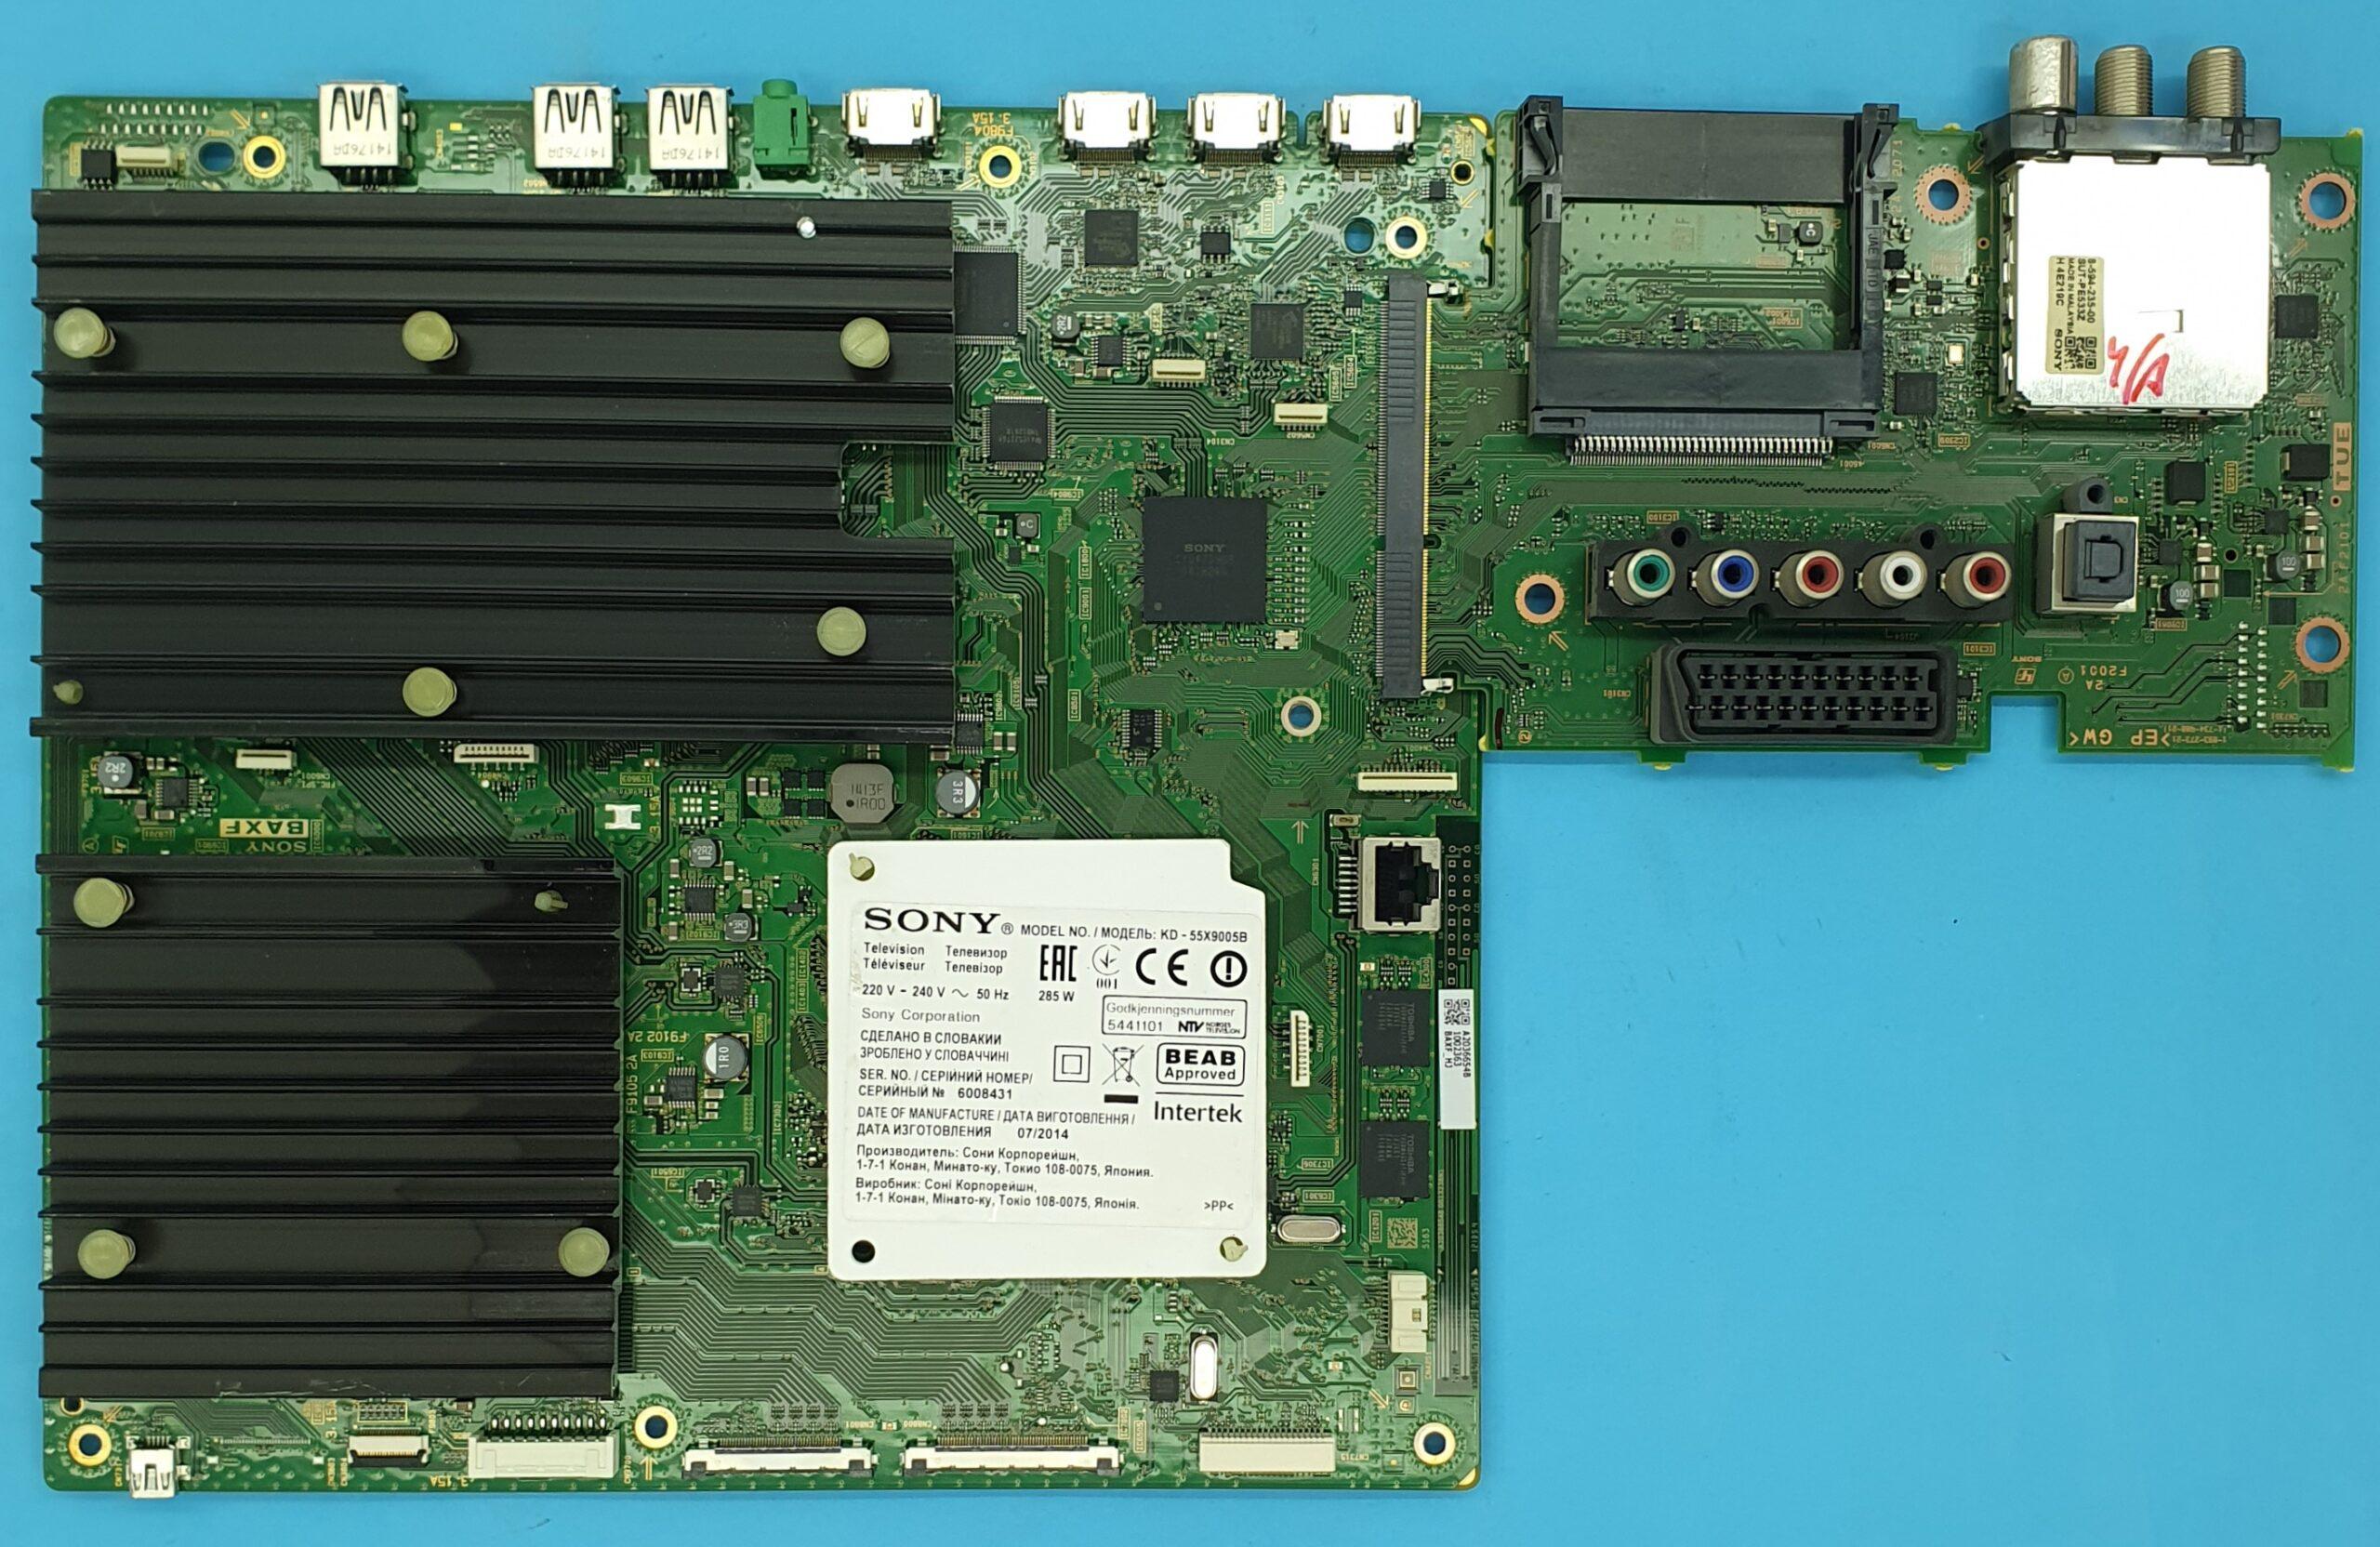 1-893-272-21 Sony Anakart (KDV DAHİL = 750 TL)